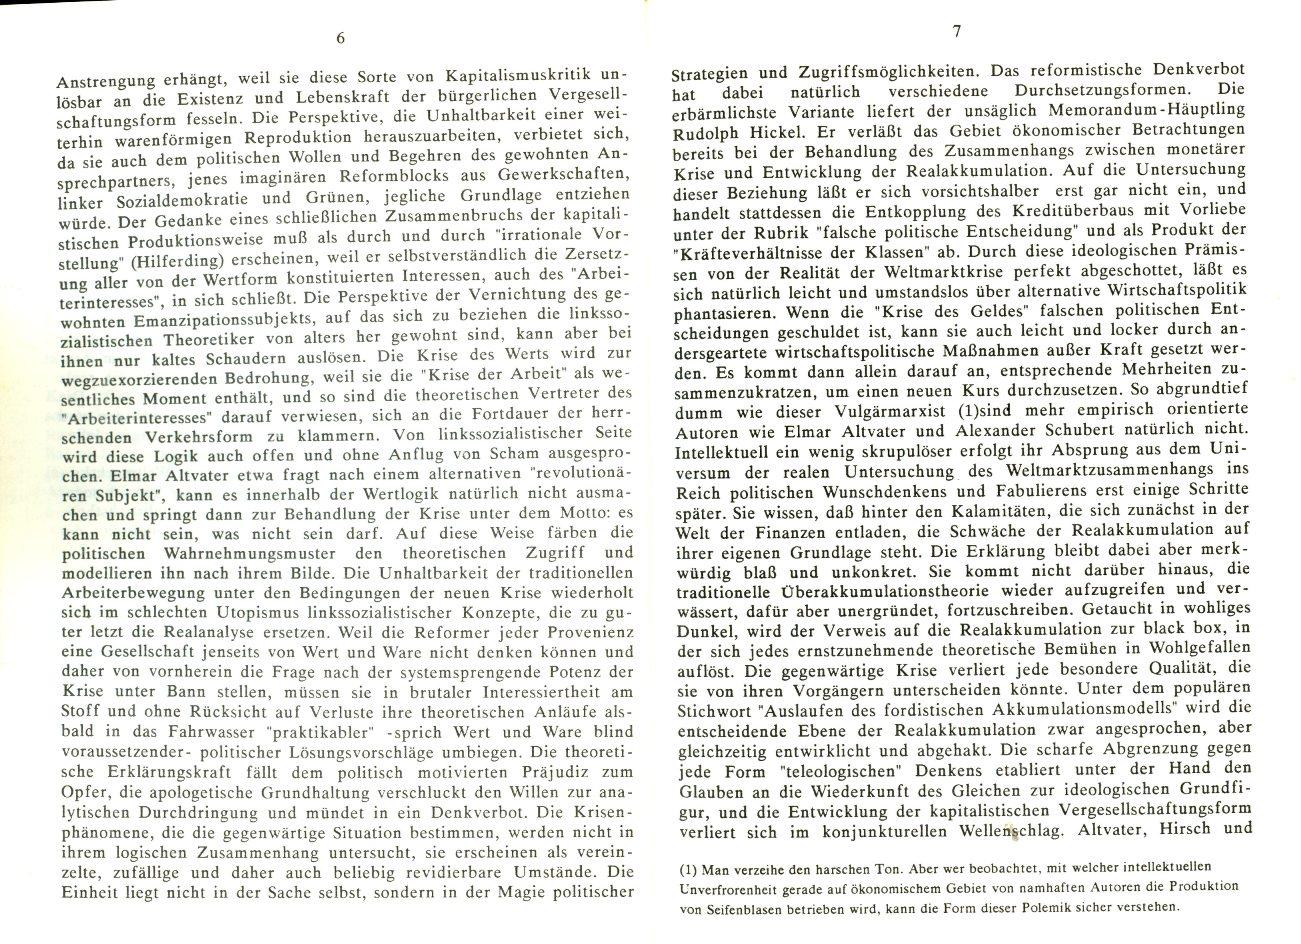 Erlangen_VMK_MK_1989_06_004